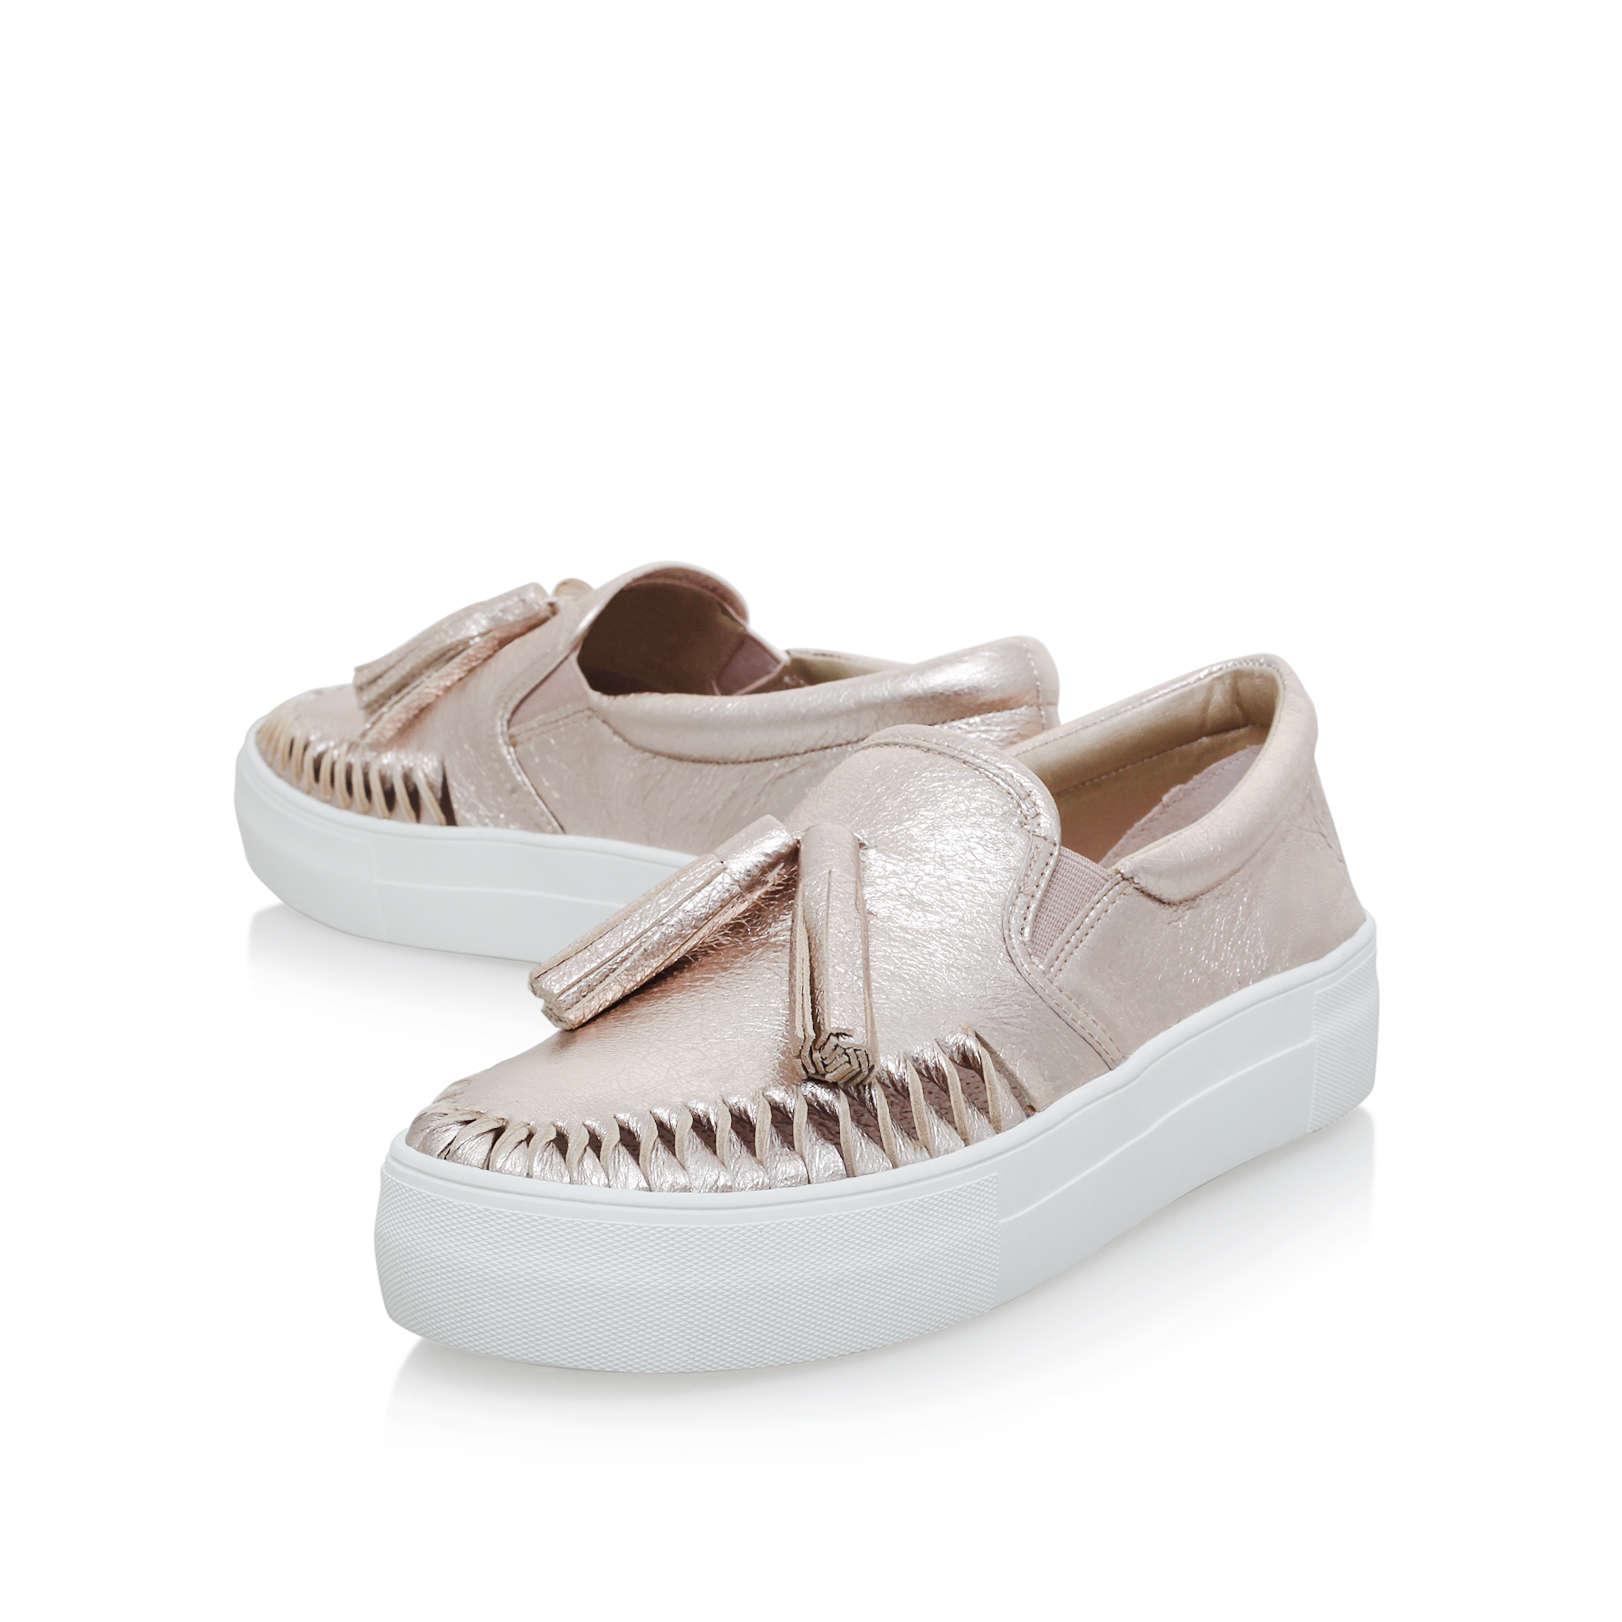 KAYLEENA Vince Camuto Kayleena Bone Flat Sneakers Flatform ...  KAYLEENA Vince ...